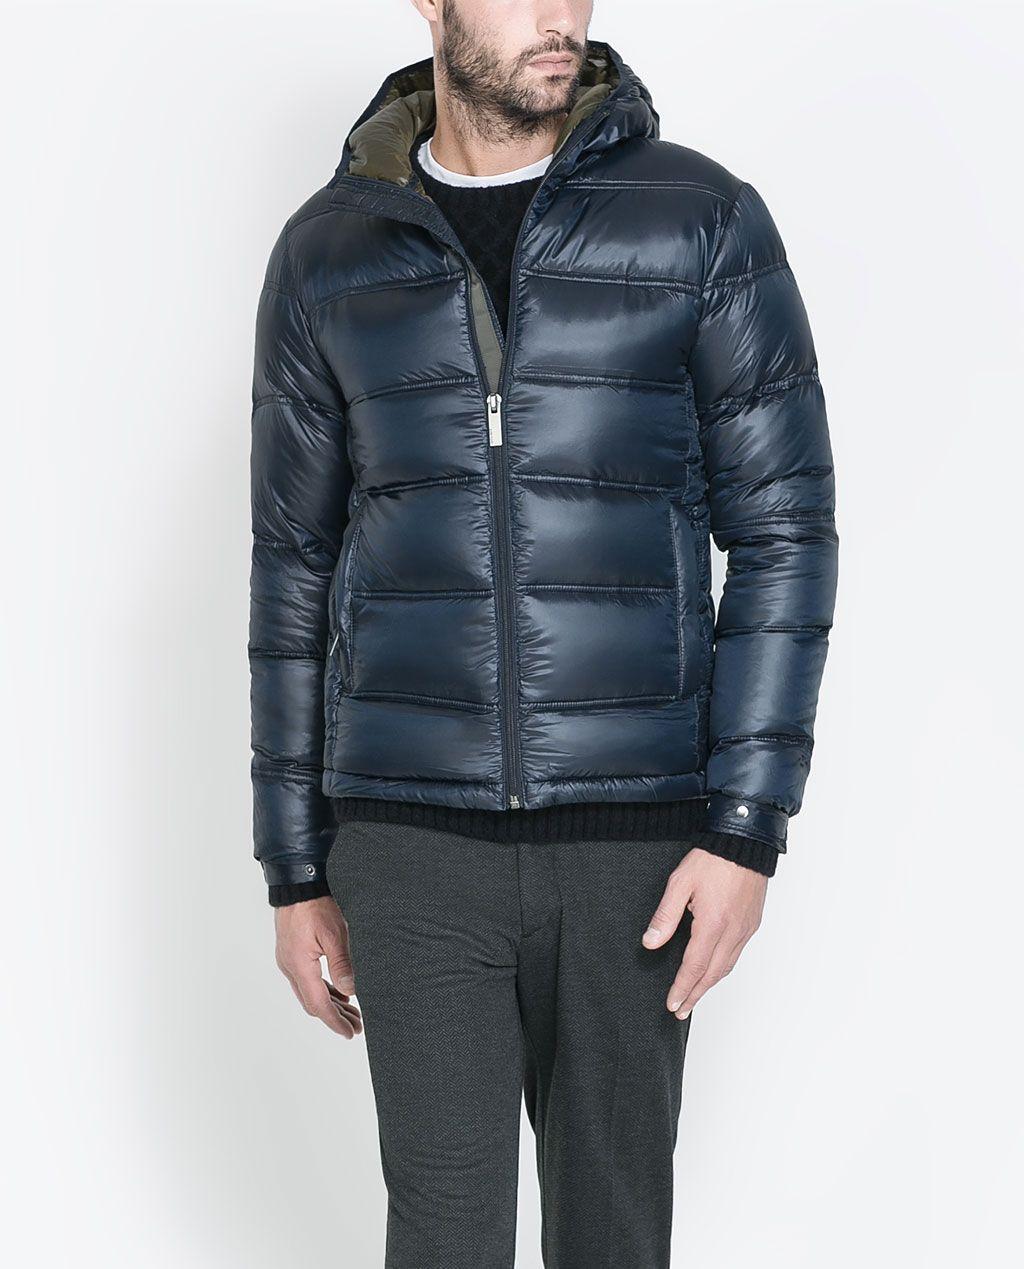 ZARA MAN QUILTED JACKET Quilted jacket, Jackets, Zara